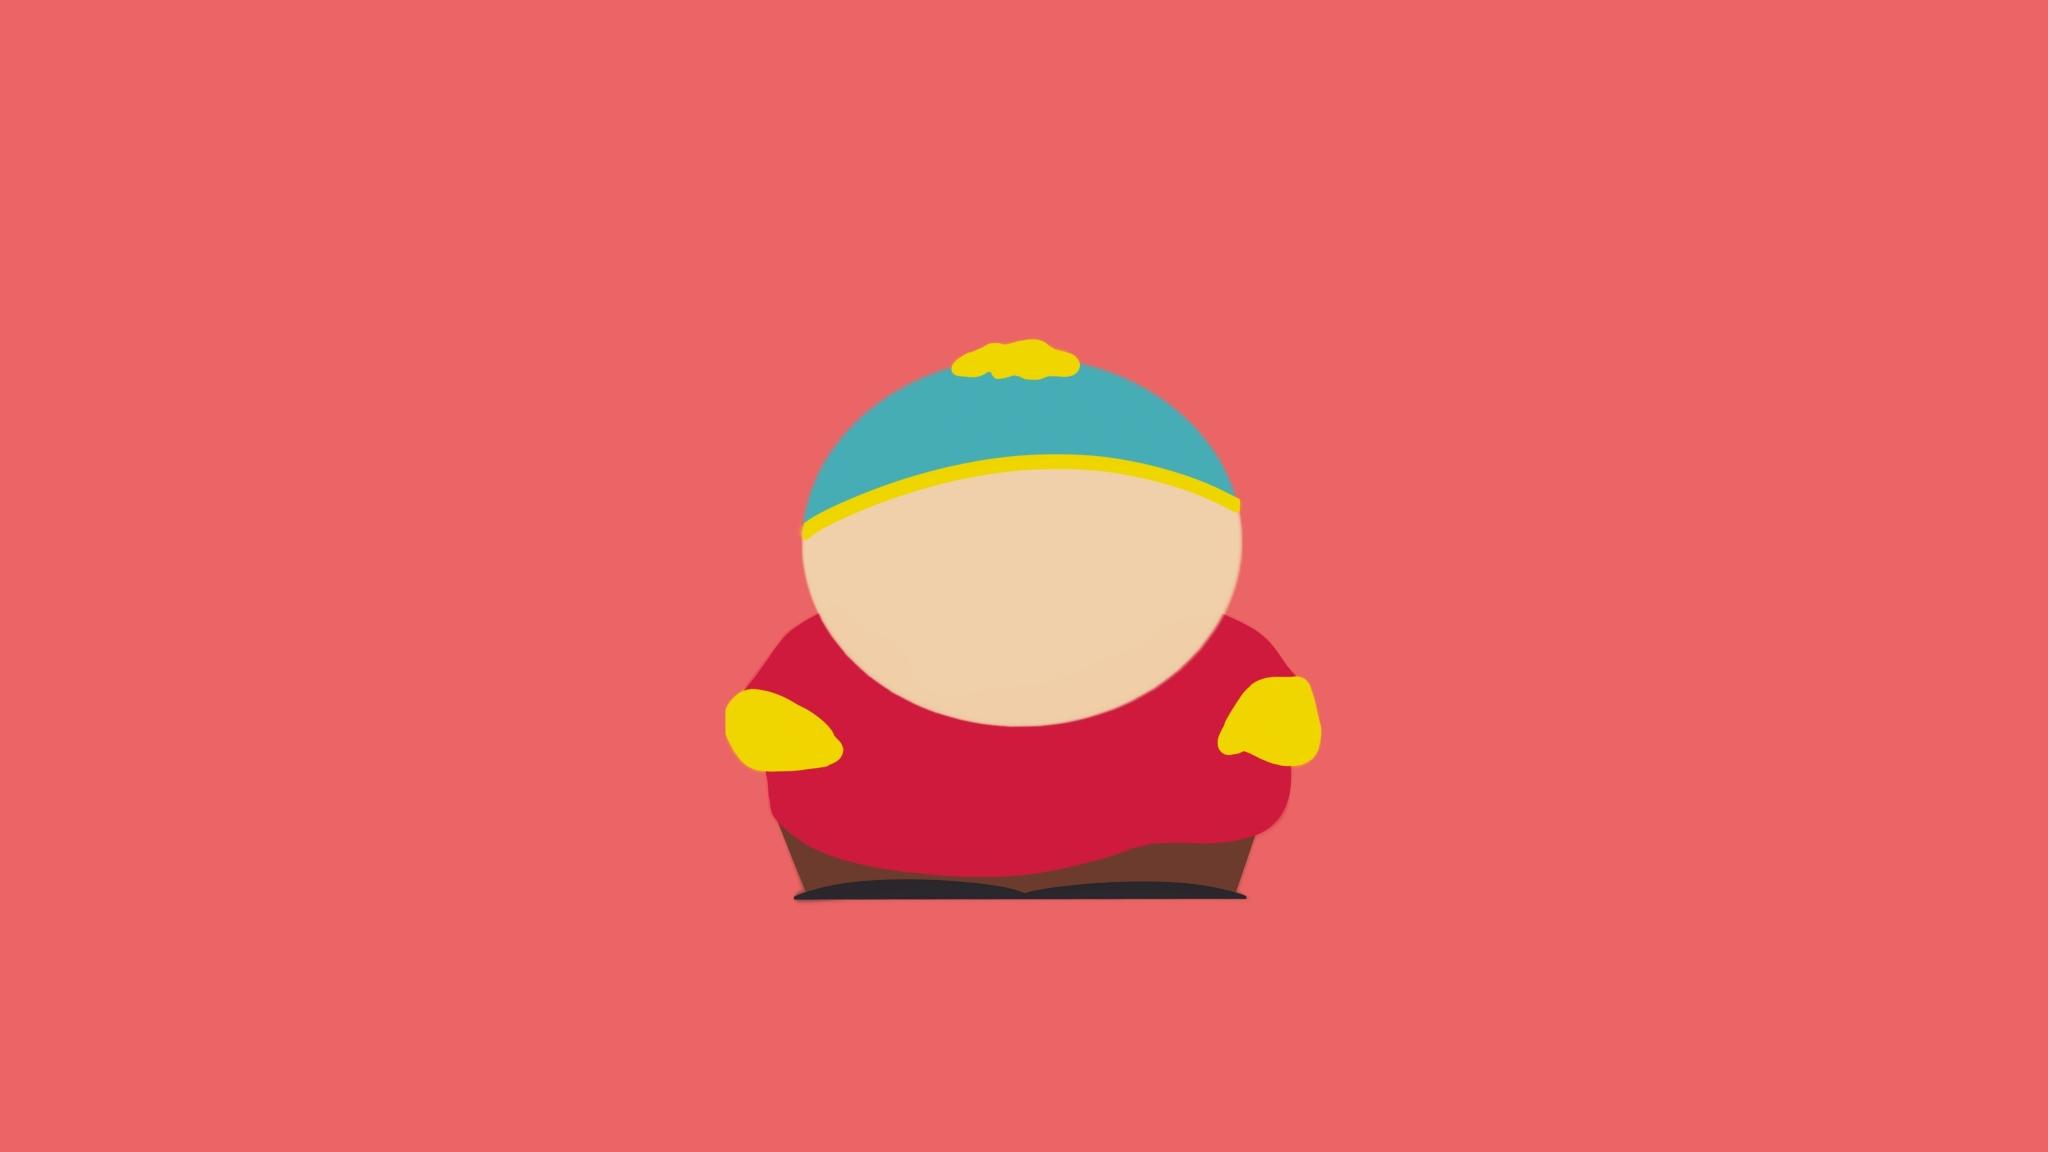 Eric Cartman South Park Minimal, HD 8K Wallpaper